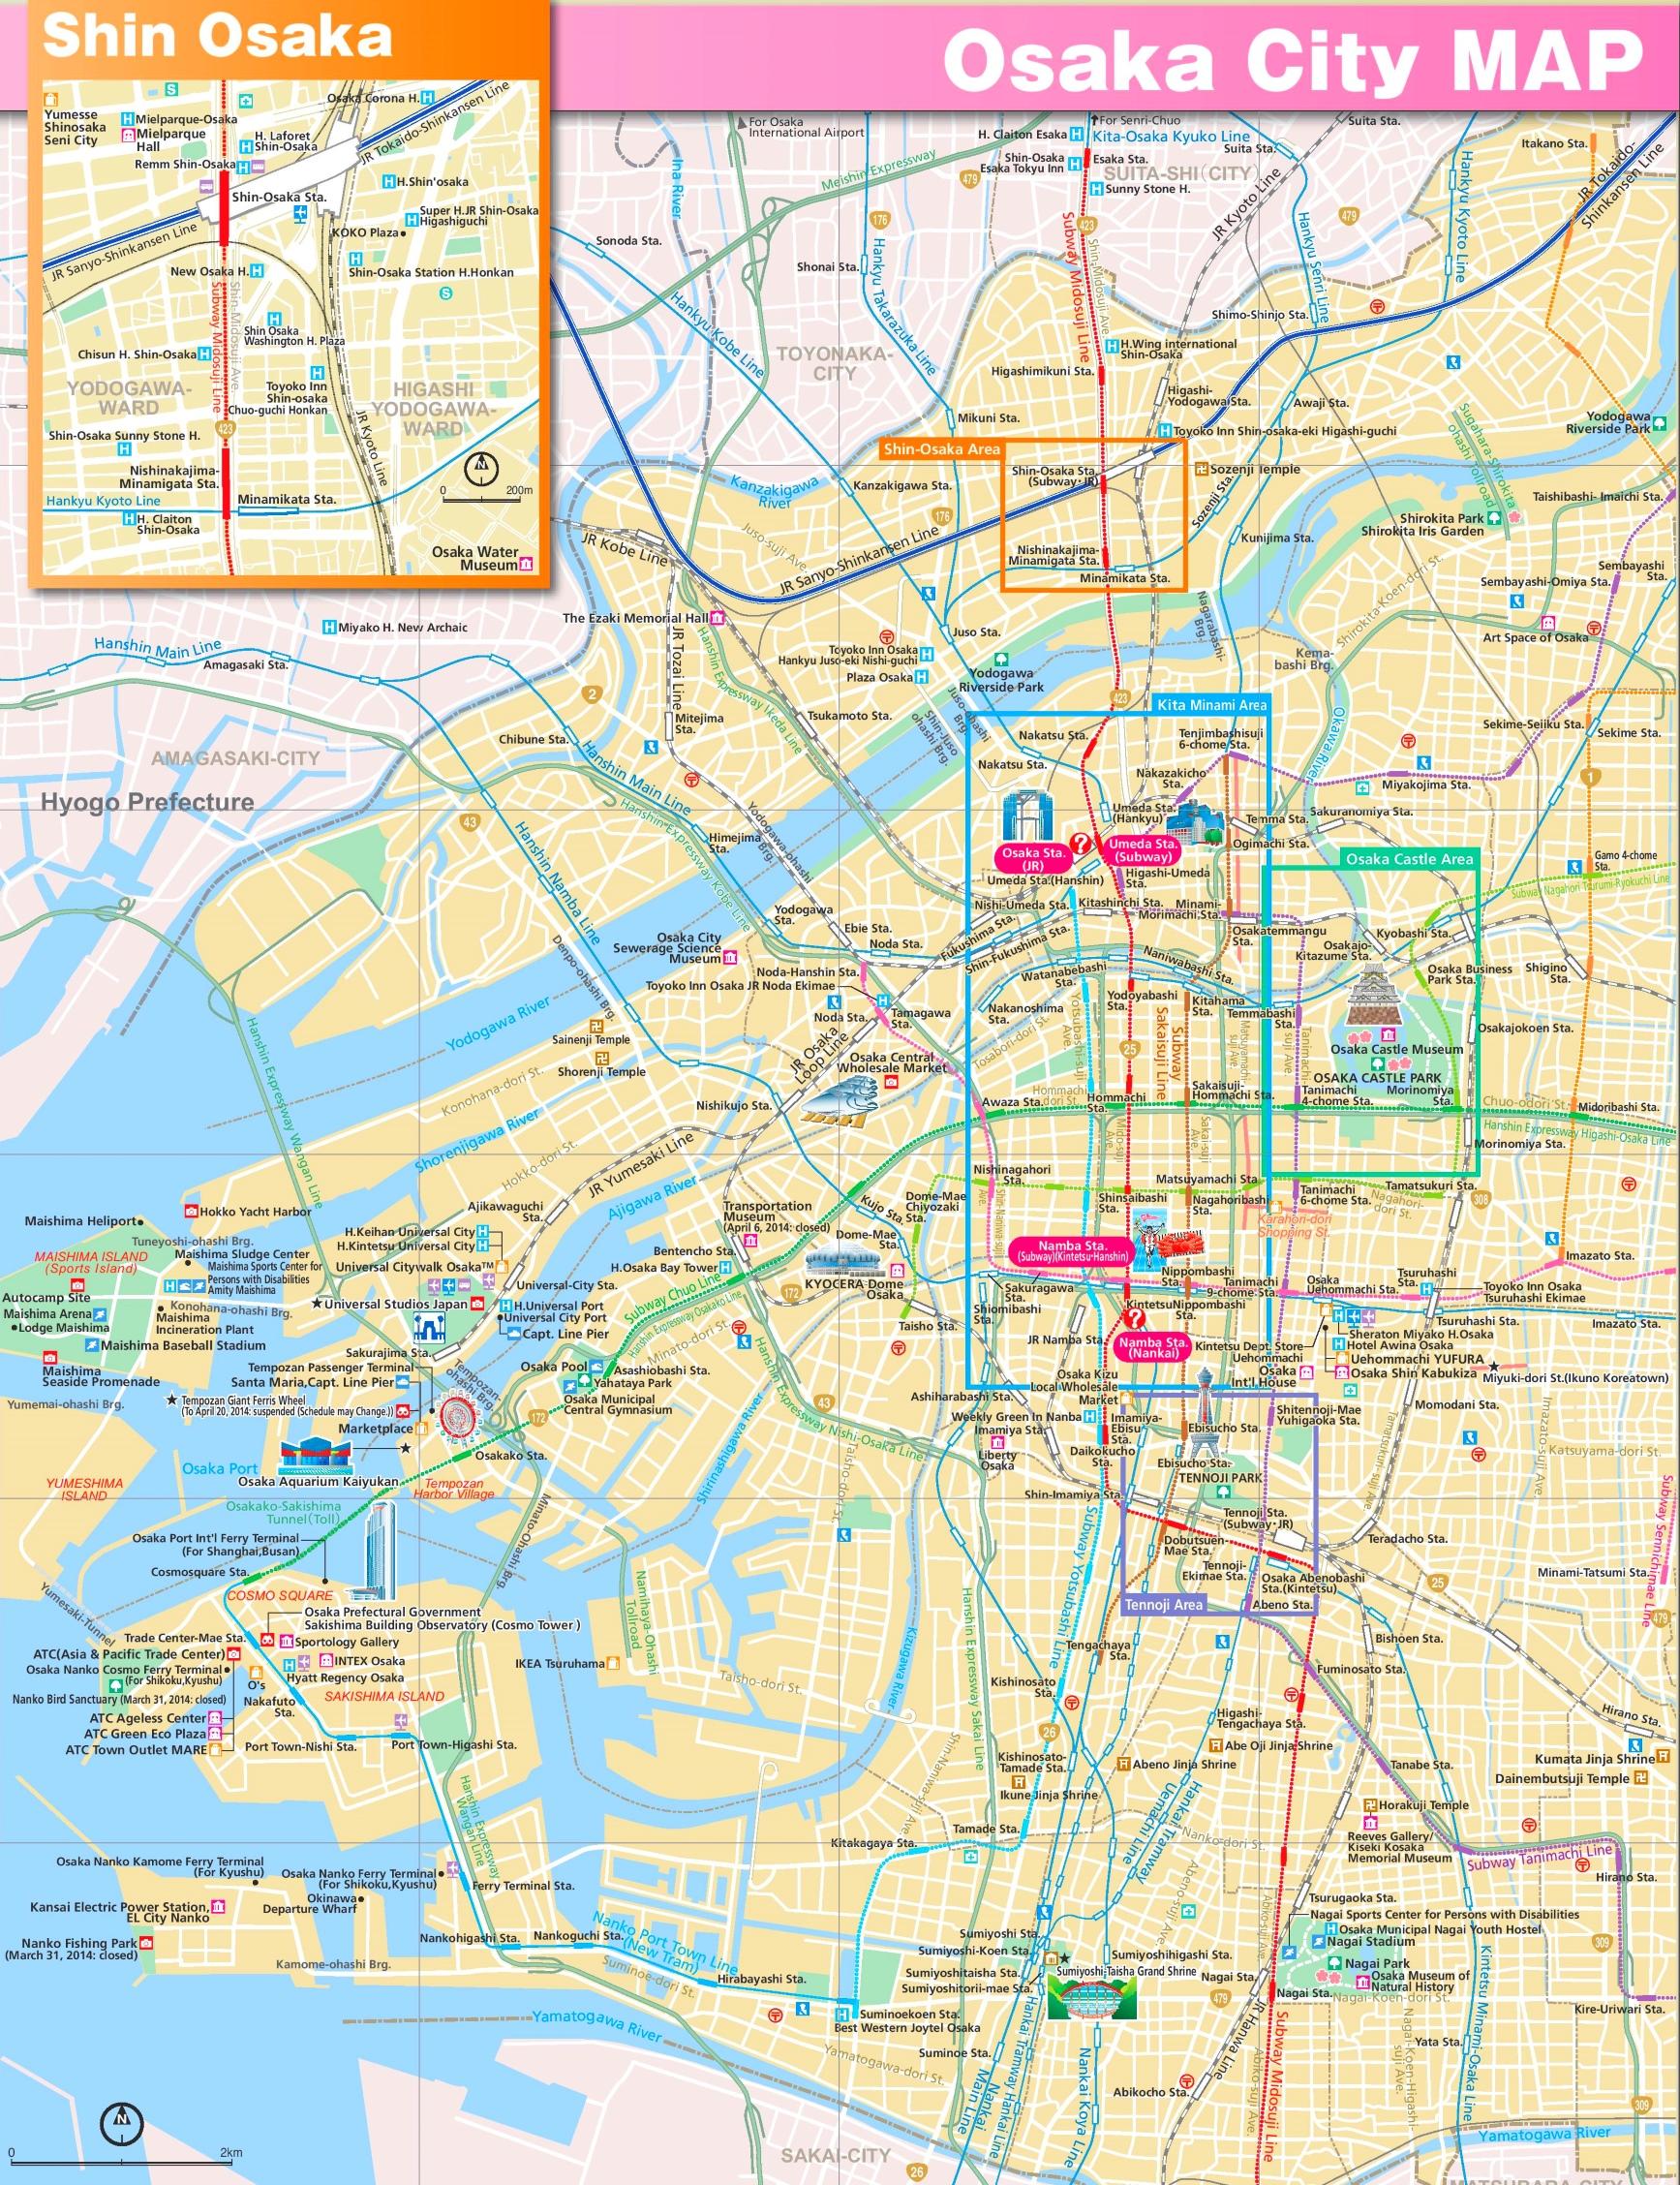 Osaka sightseeing map